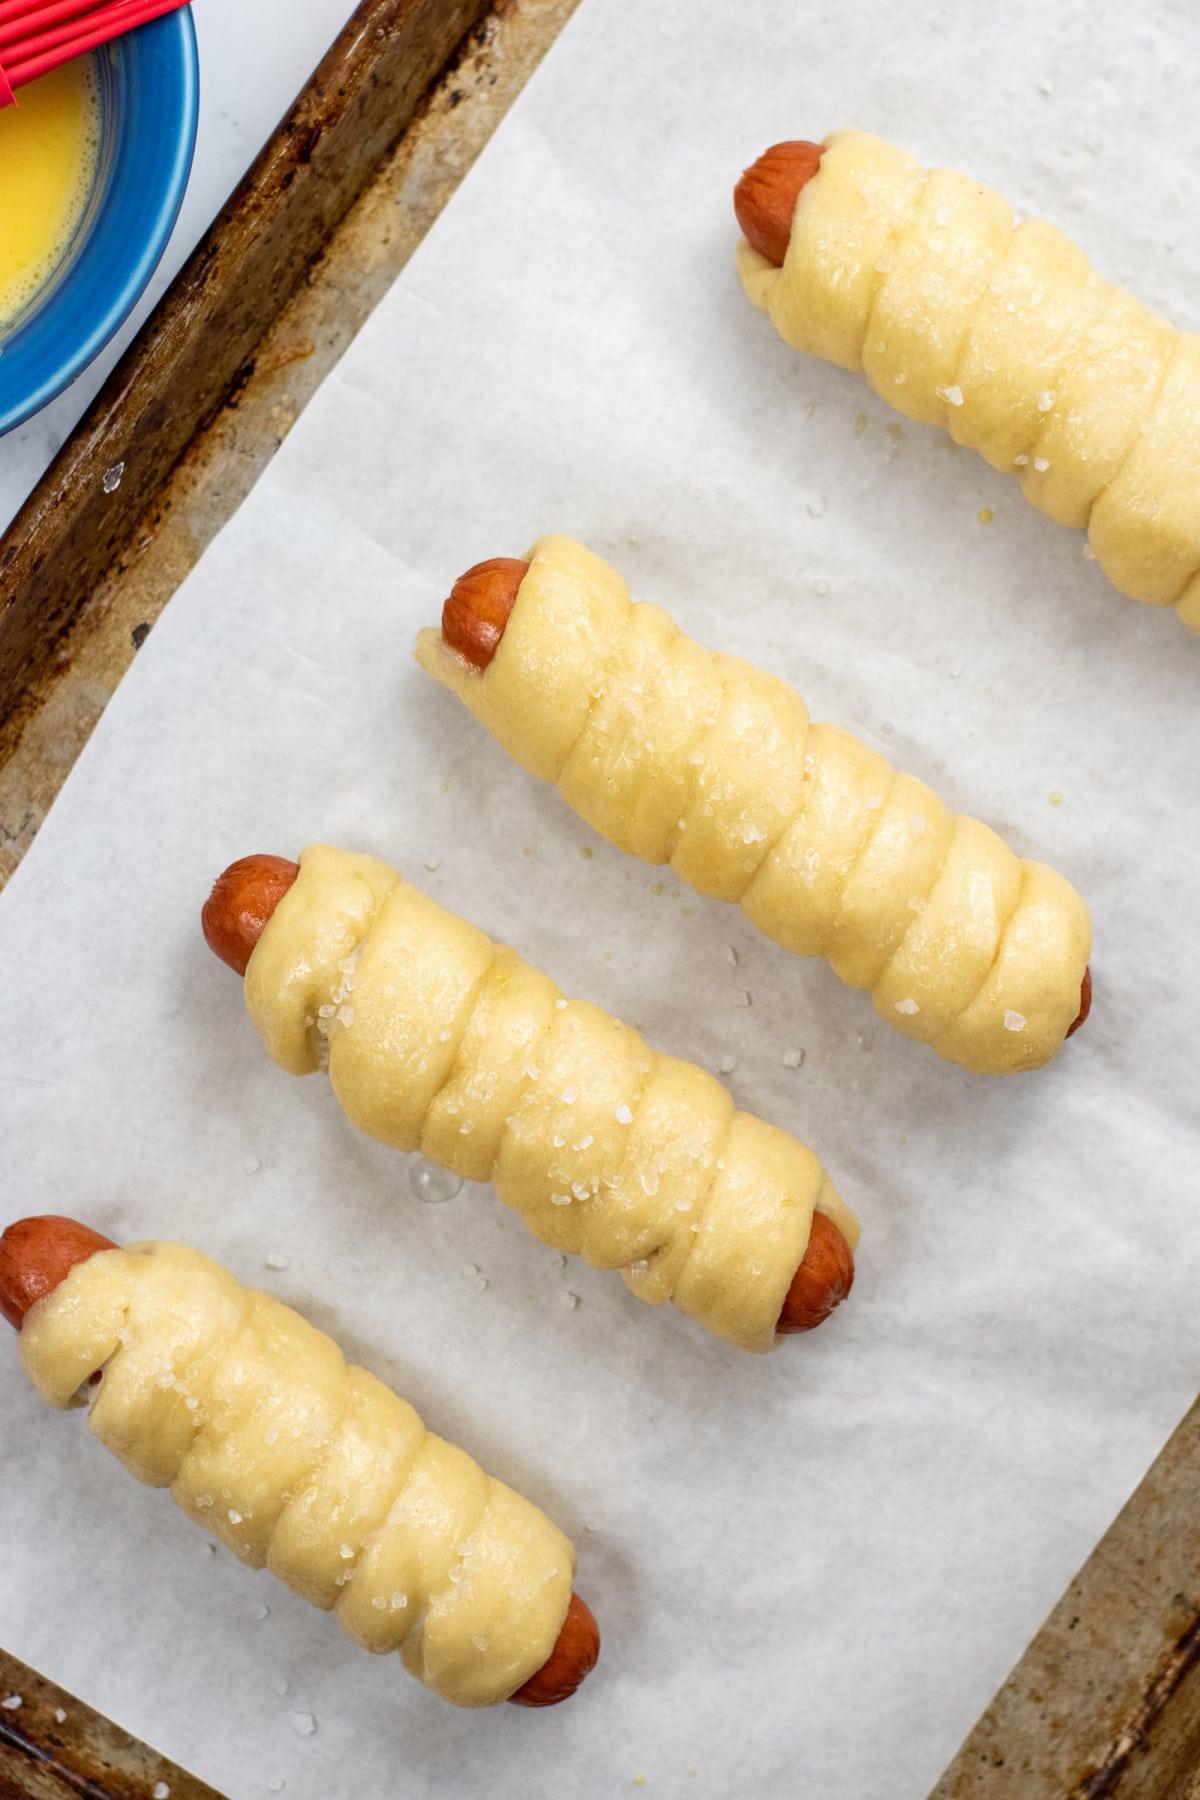 Salted pretzel dogs on a baking sheet